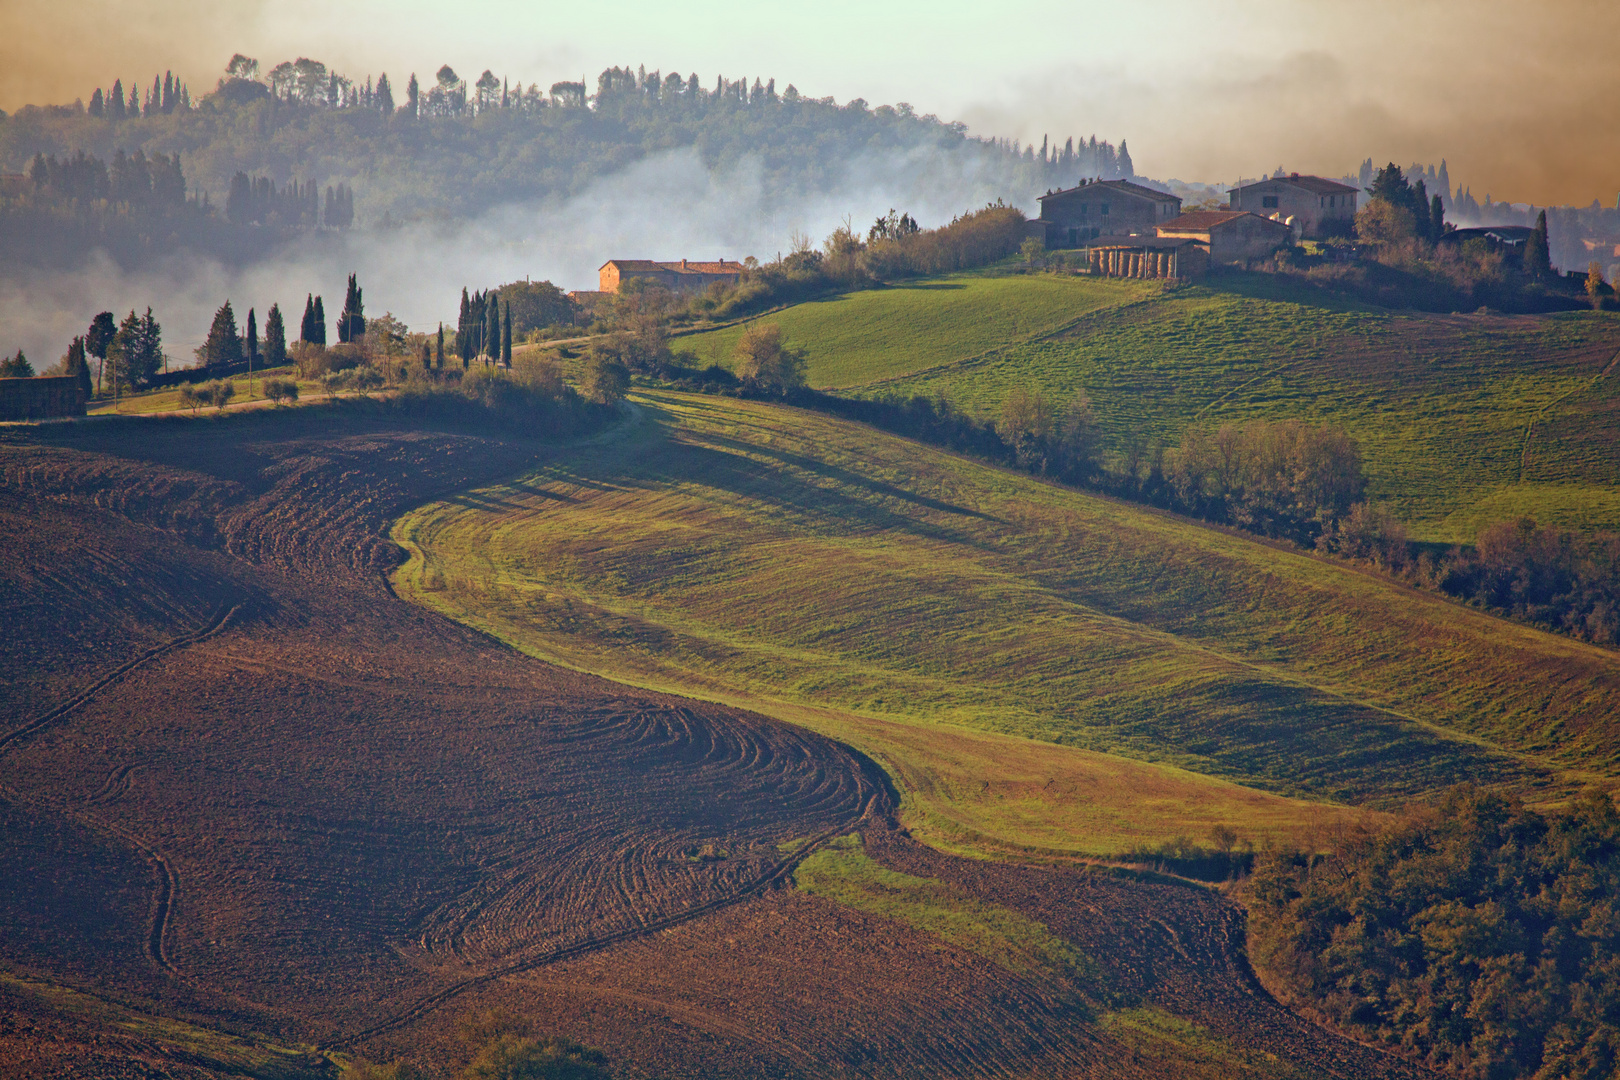 Herbstliche Toskana